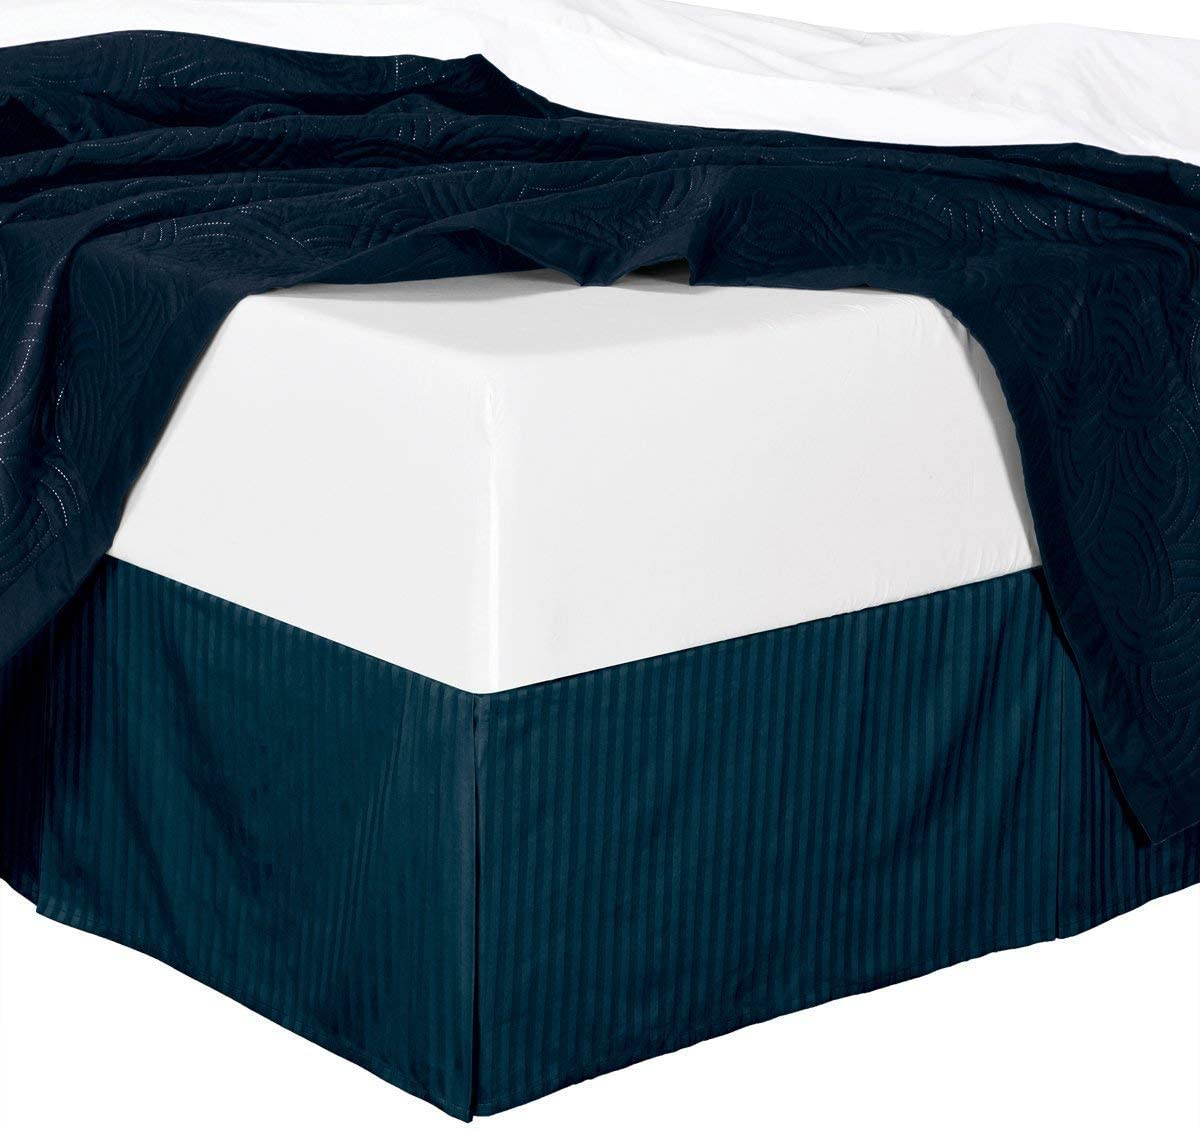 Incredible Beddings Hotel Quality King 1-PC Size Corner Split 在庫限り 直営ストア